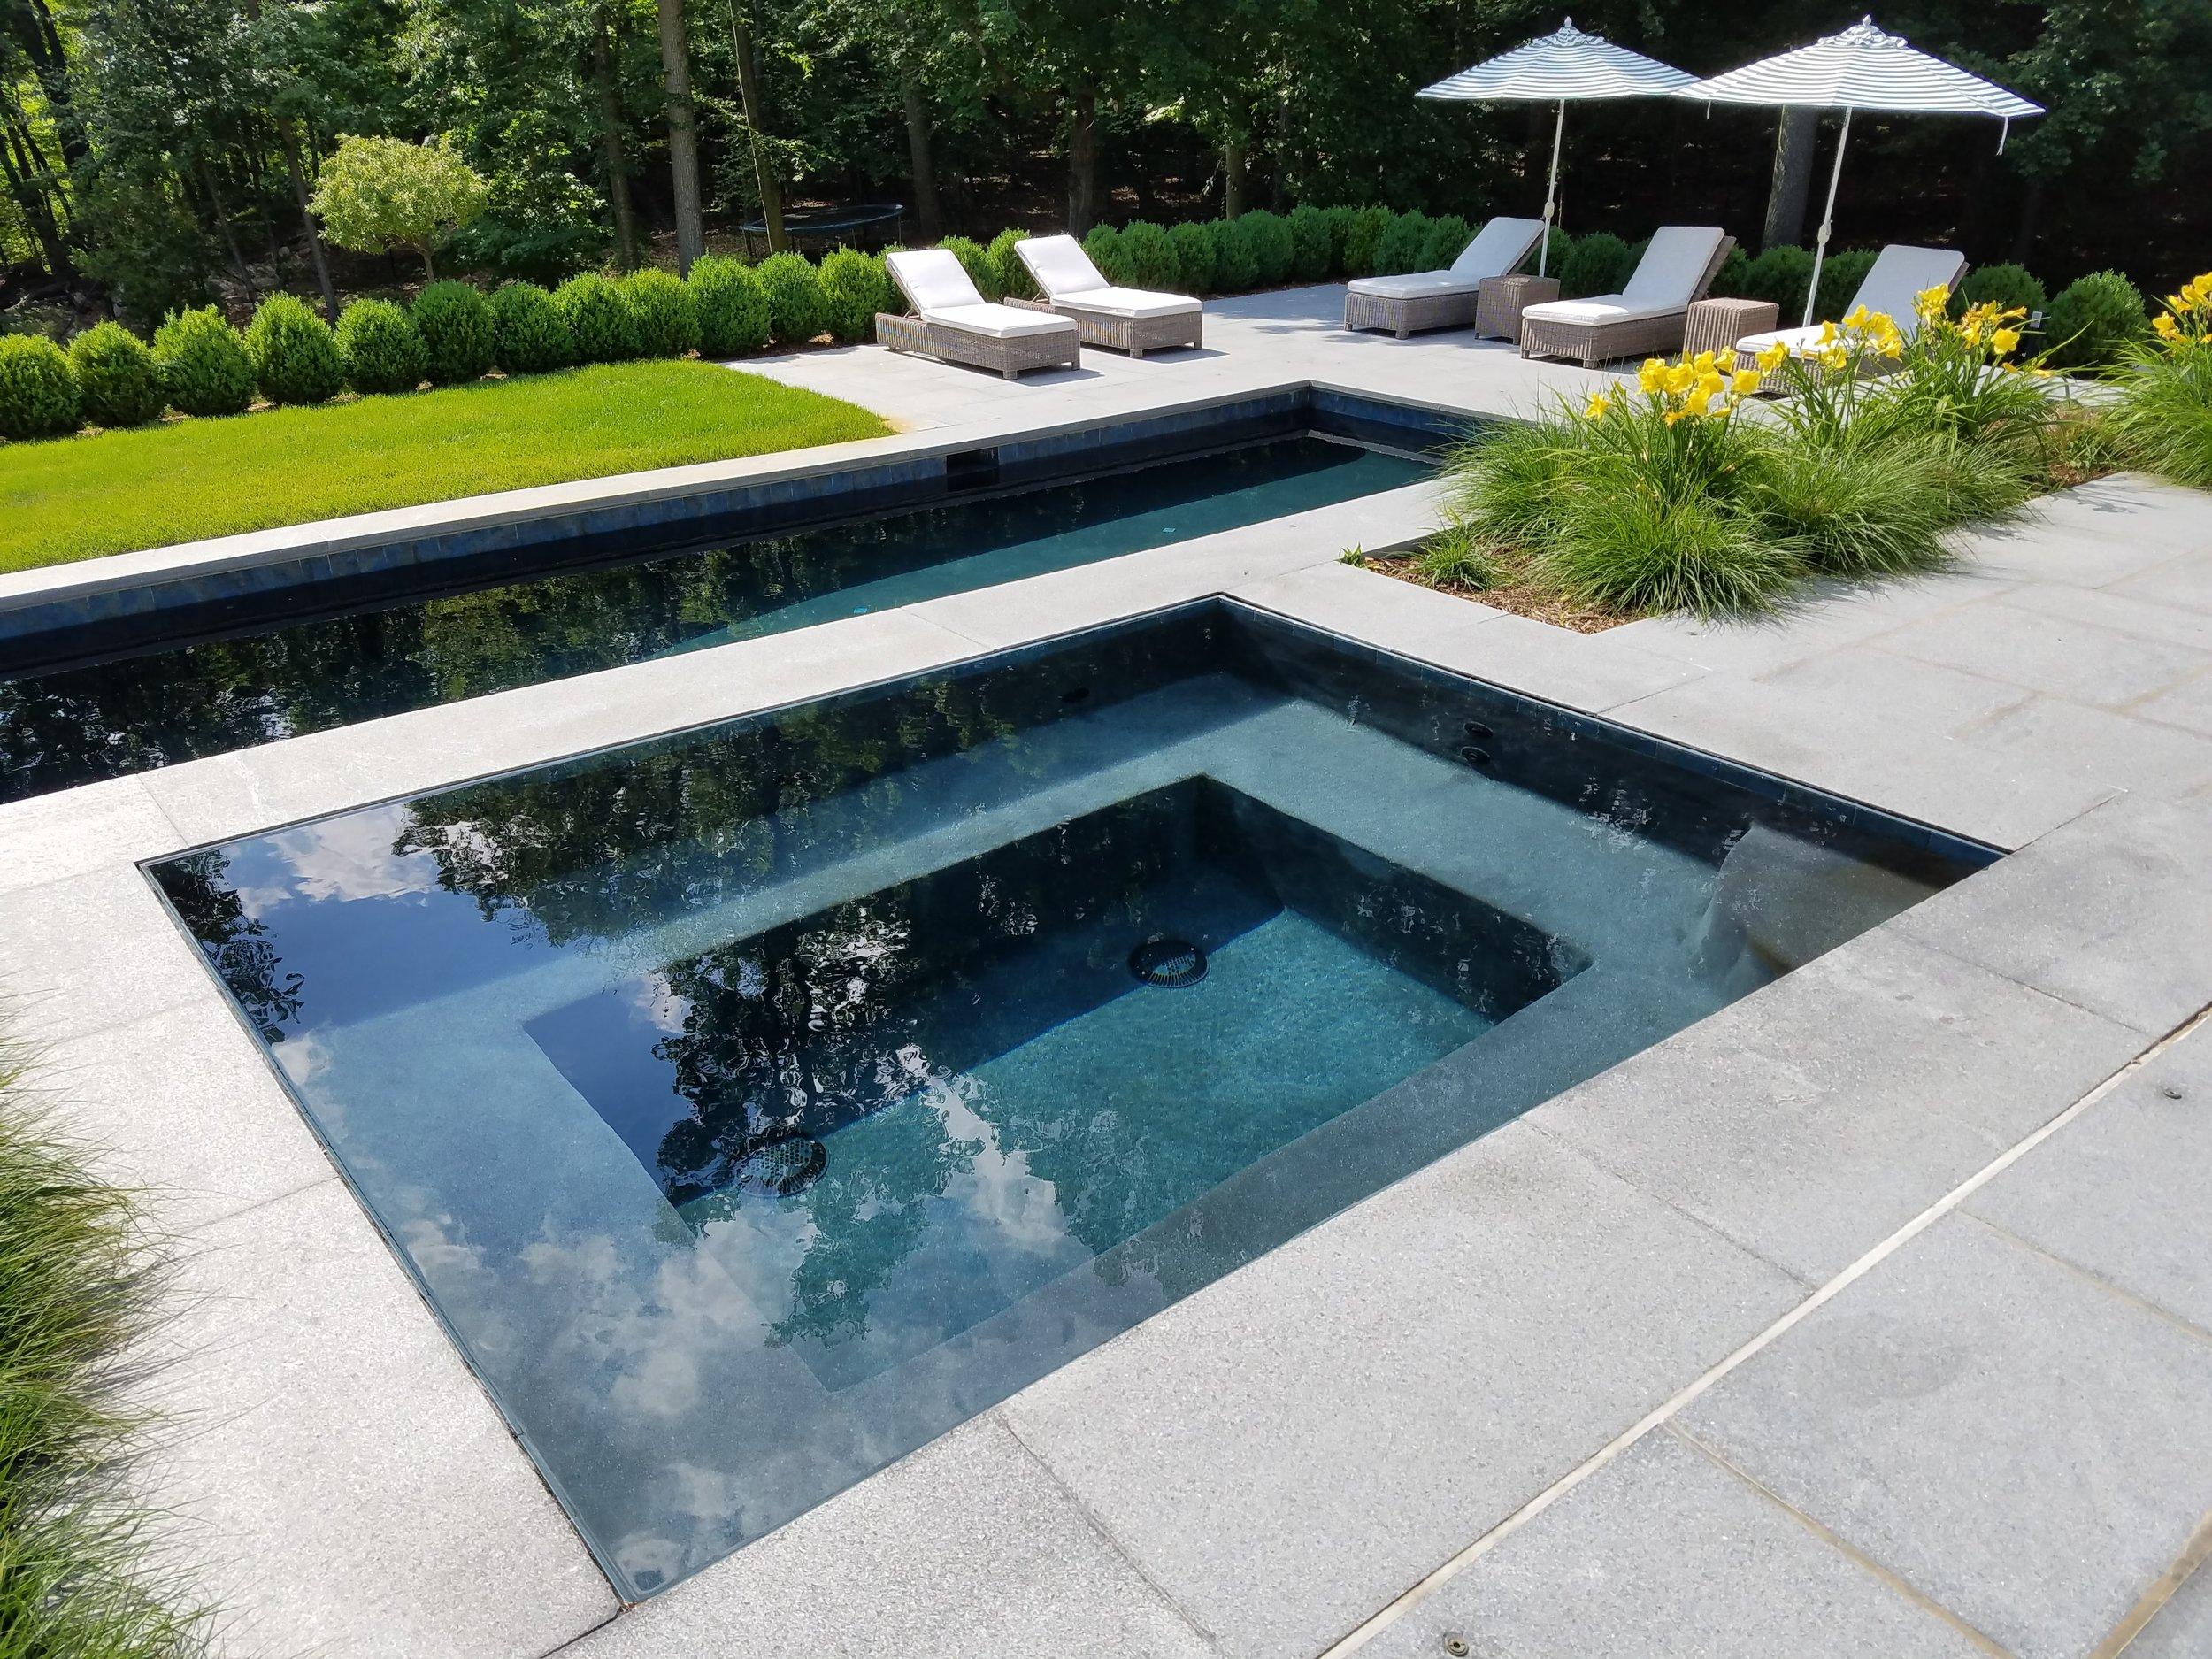 Ridgefield Lautner Edge spa with lower pool entertaining area.